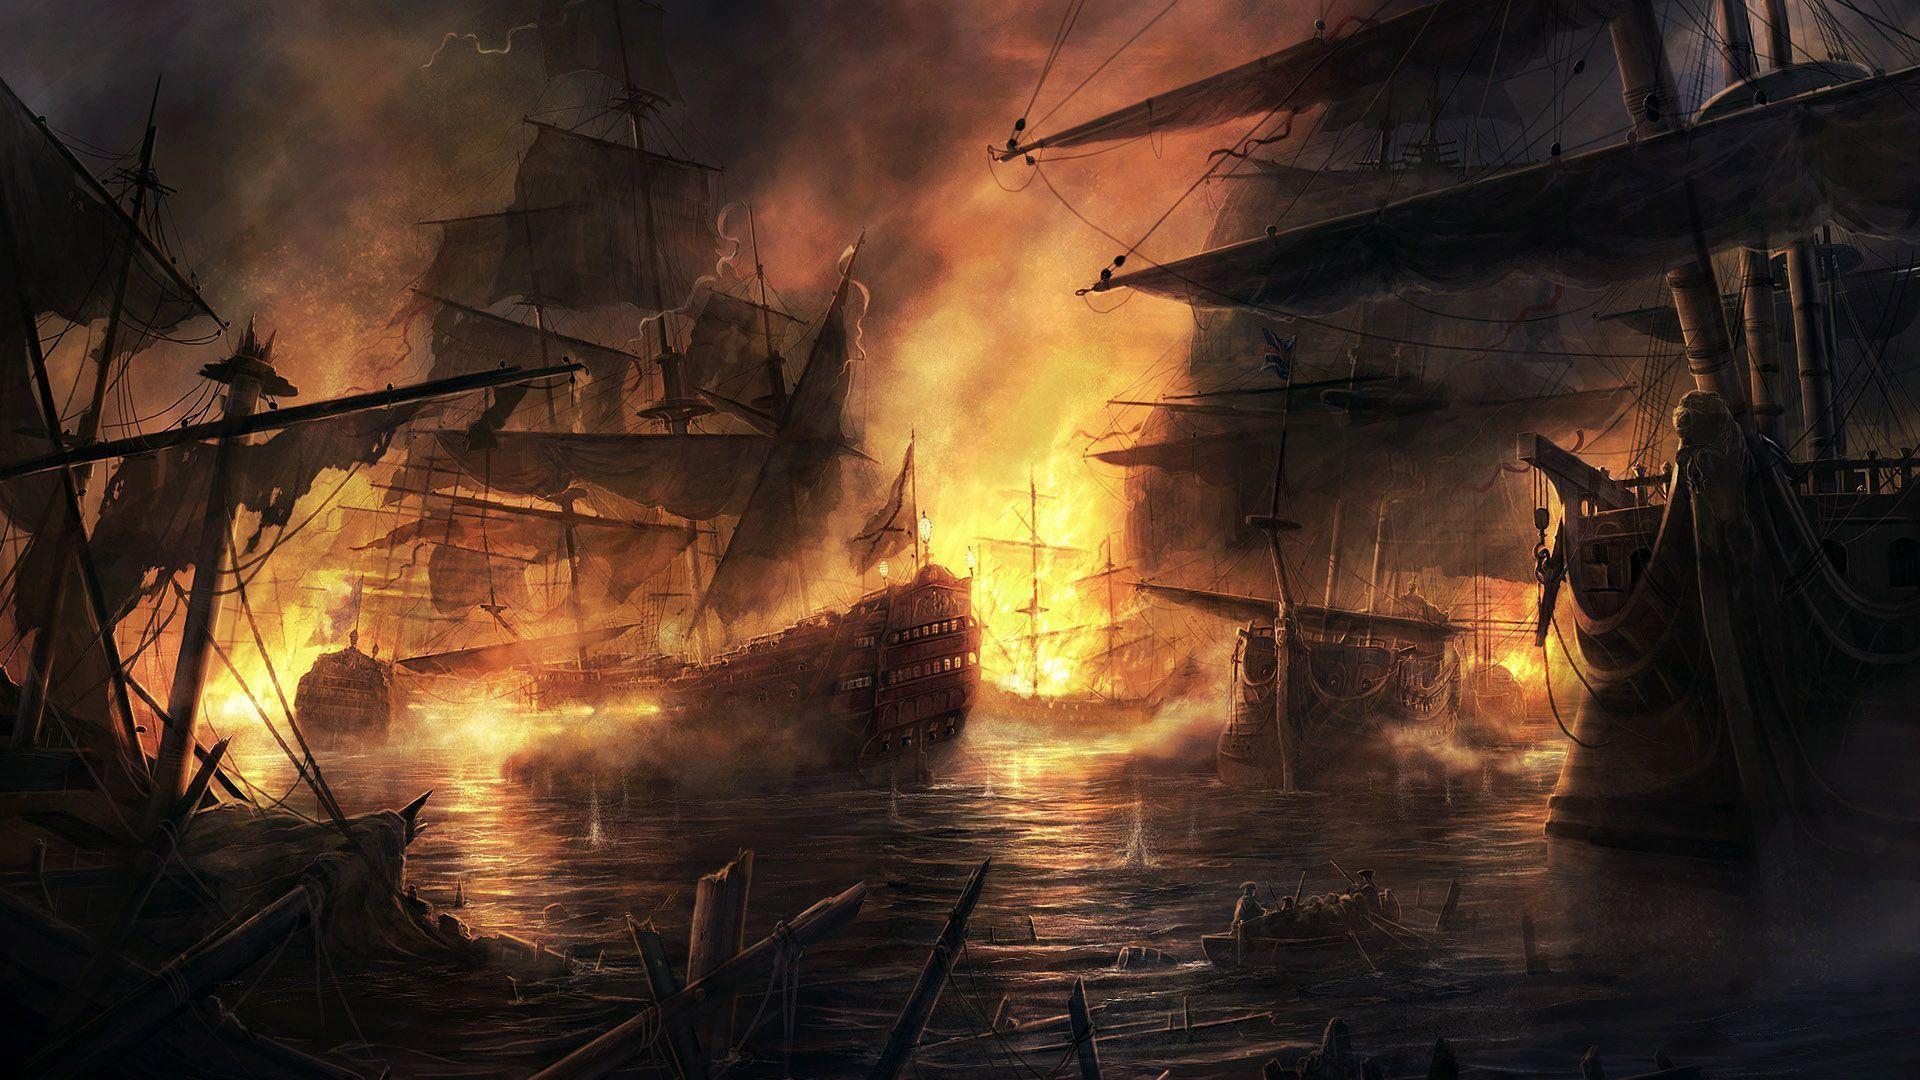 Pirate ship iphone wallpaper - photo#46